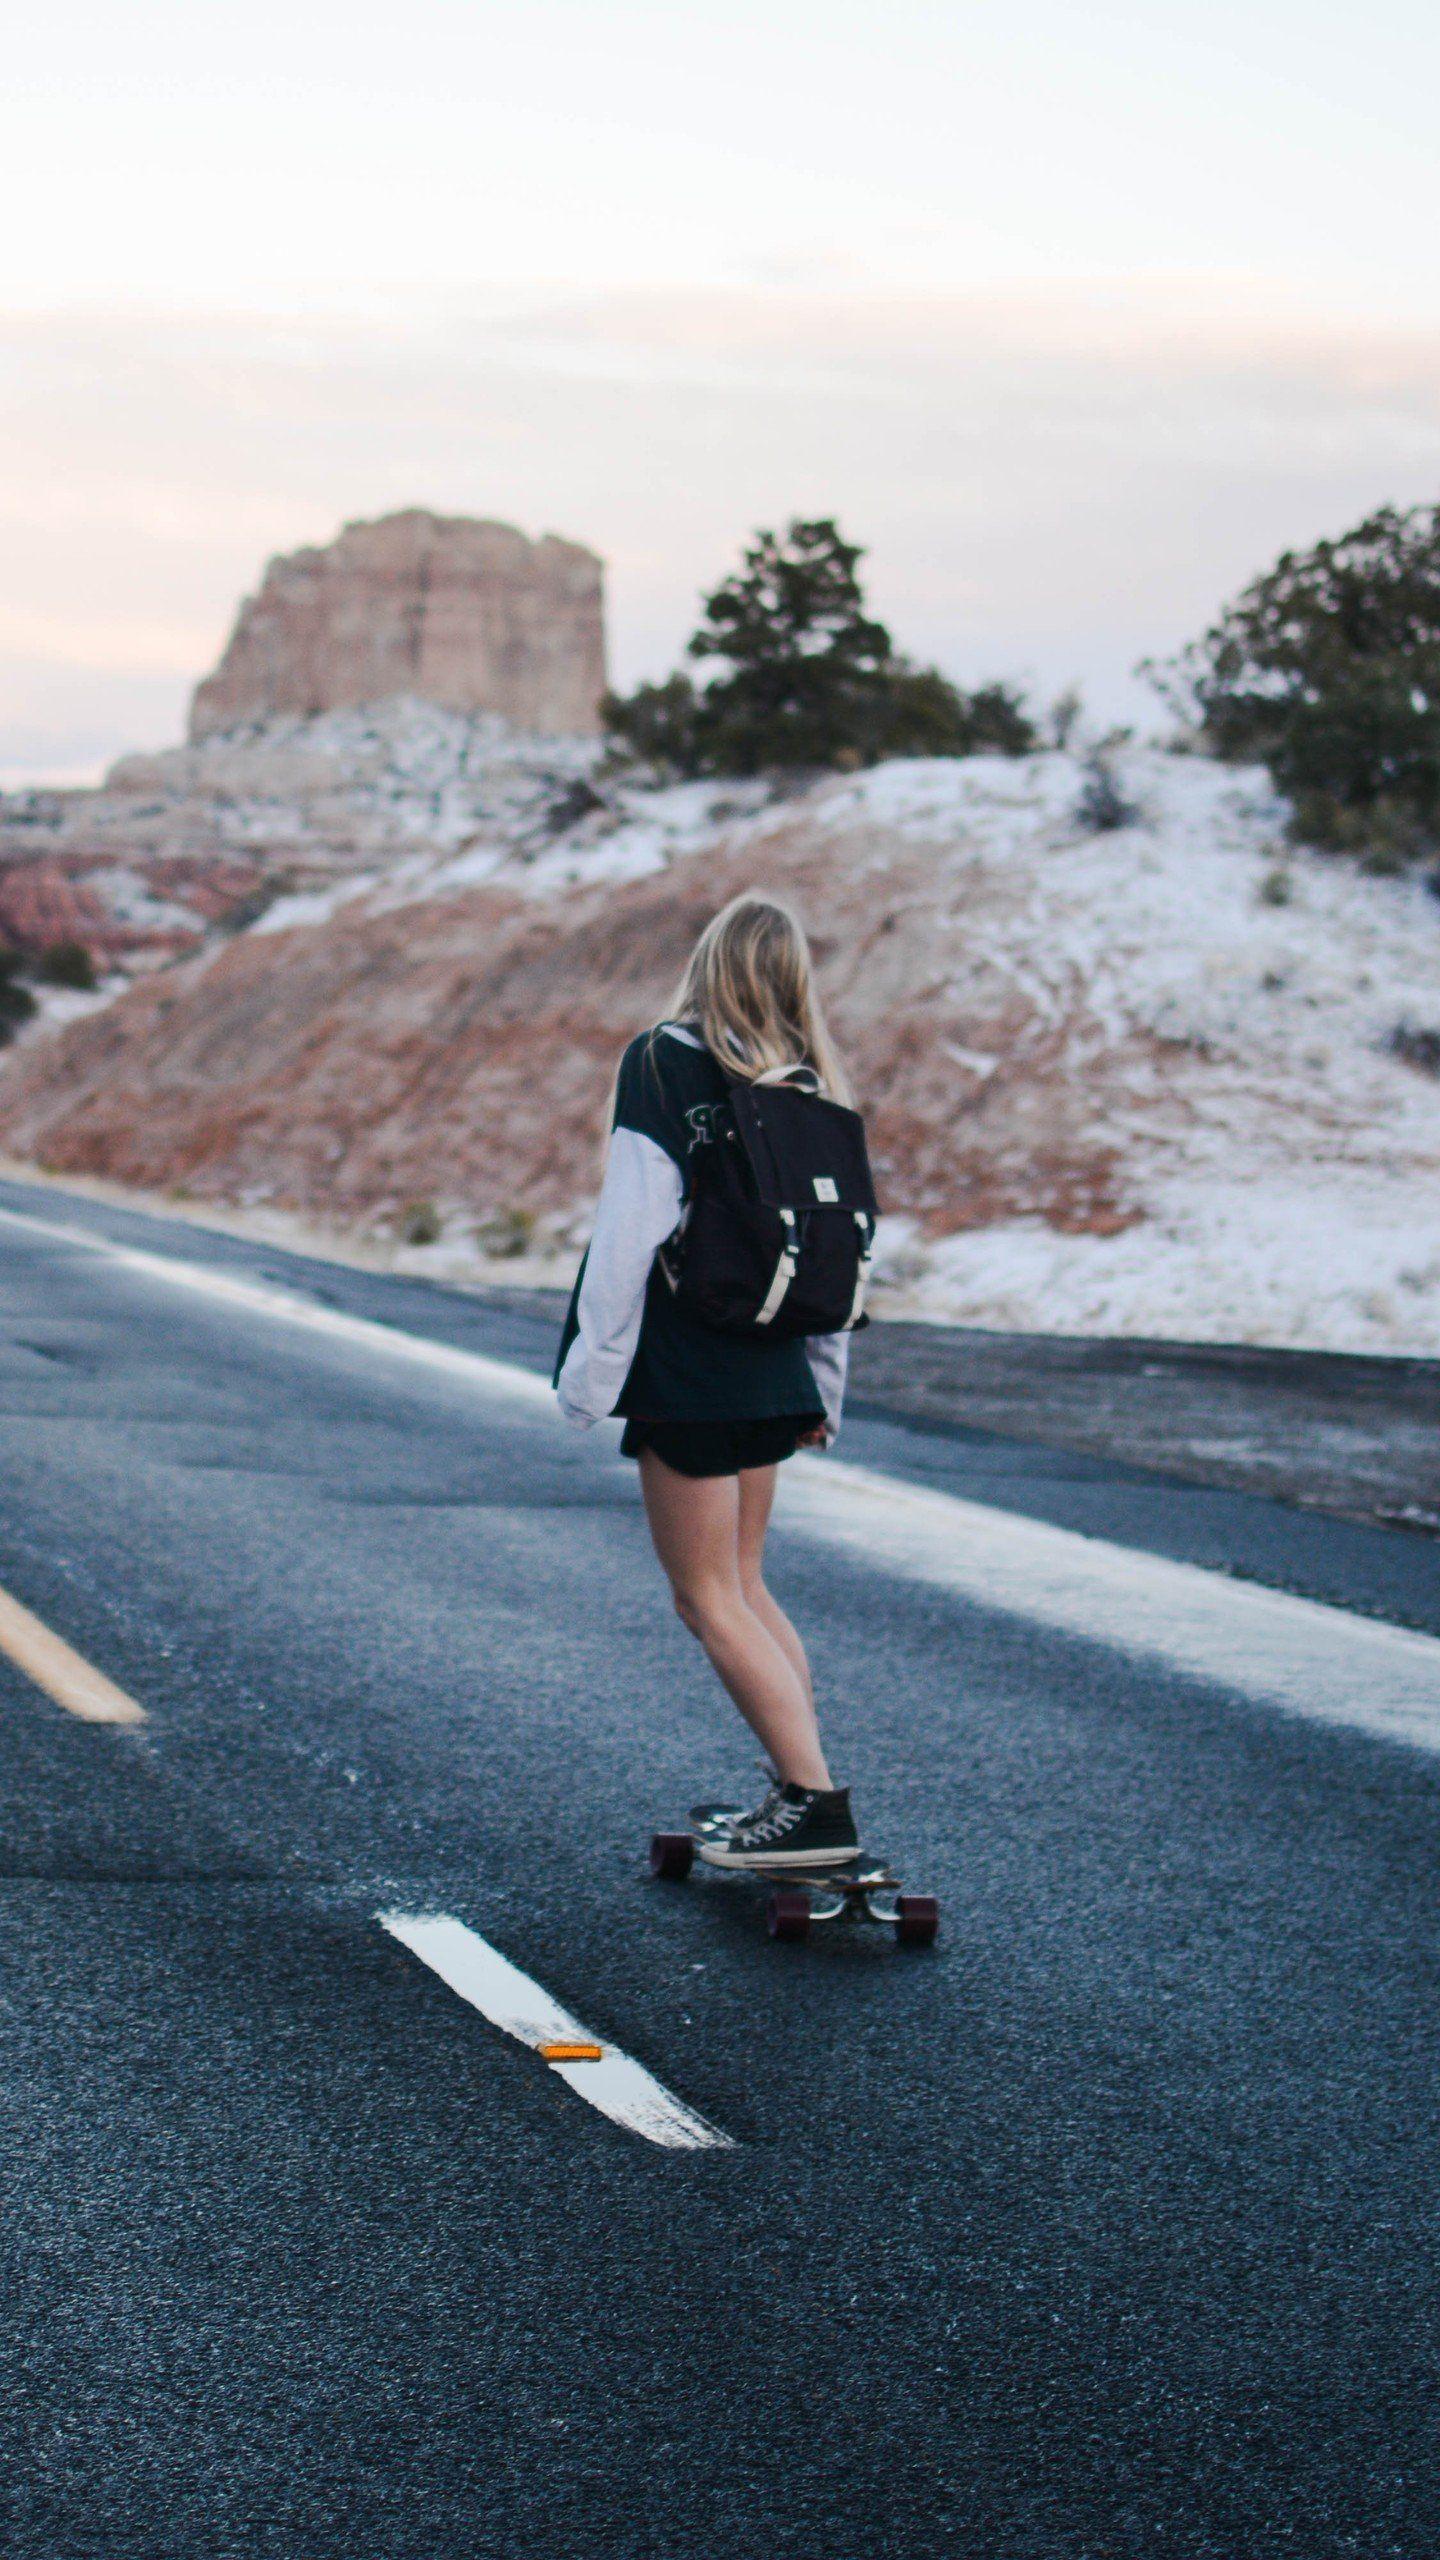 Skateboard Girl 4K 5K, HD Photography Wallpapers Photos